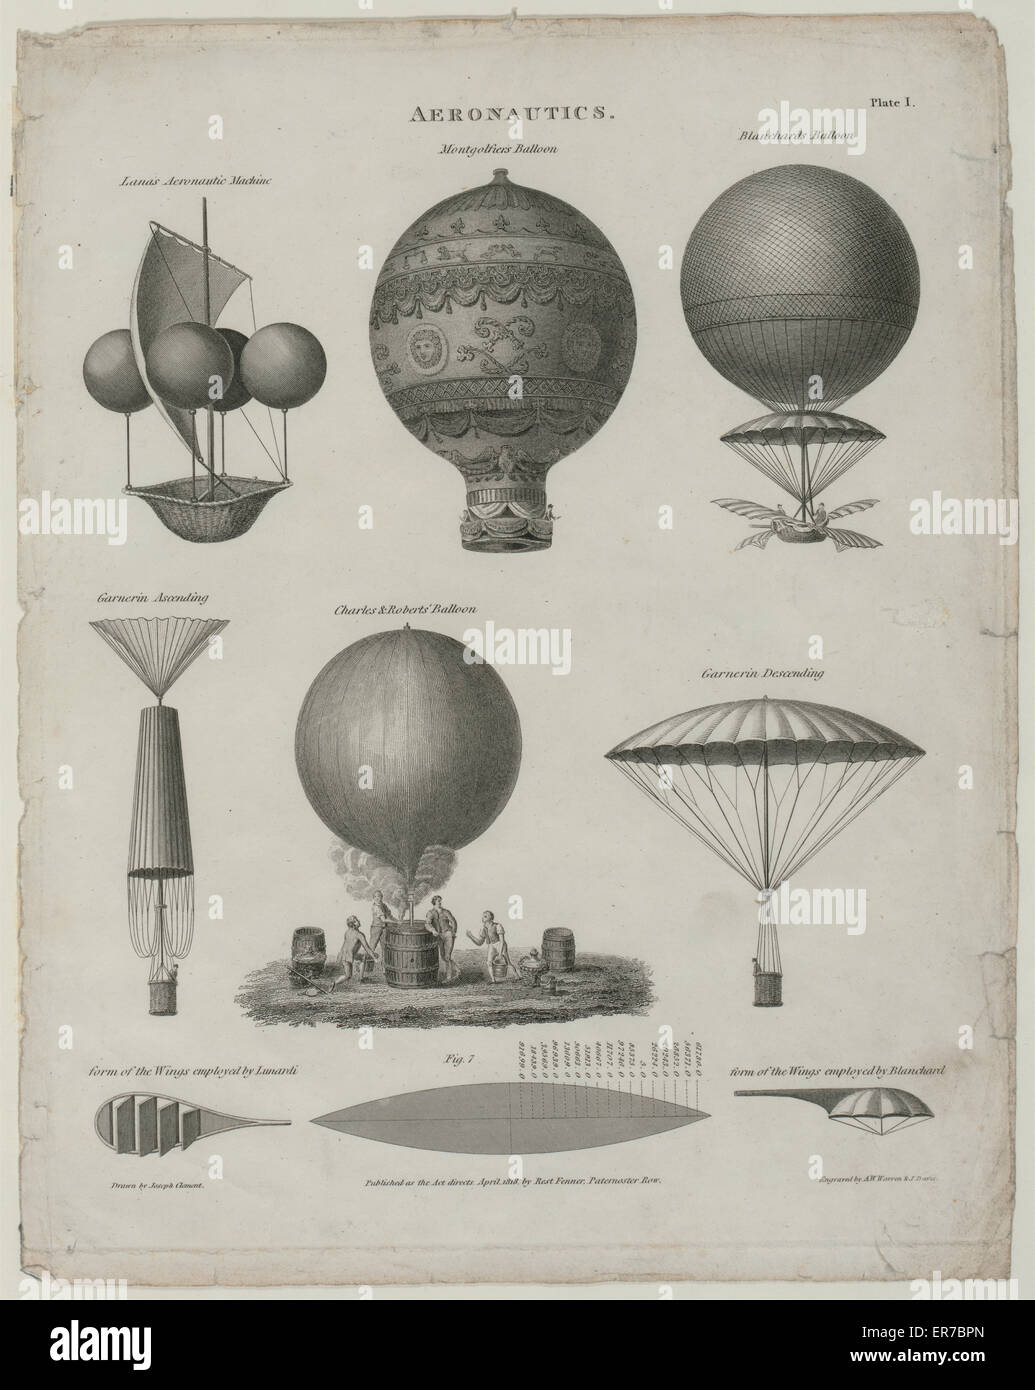 Aeronautics. Technical illustration shows early balloon designs: Lana's aeronautic machine, Montgolfiers' - Stock Image